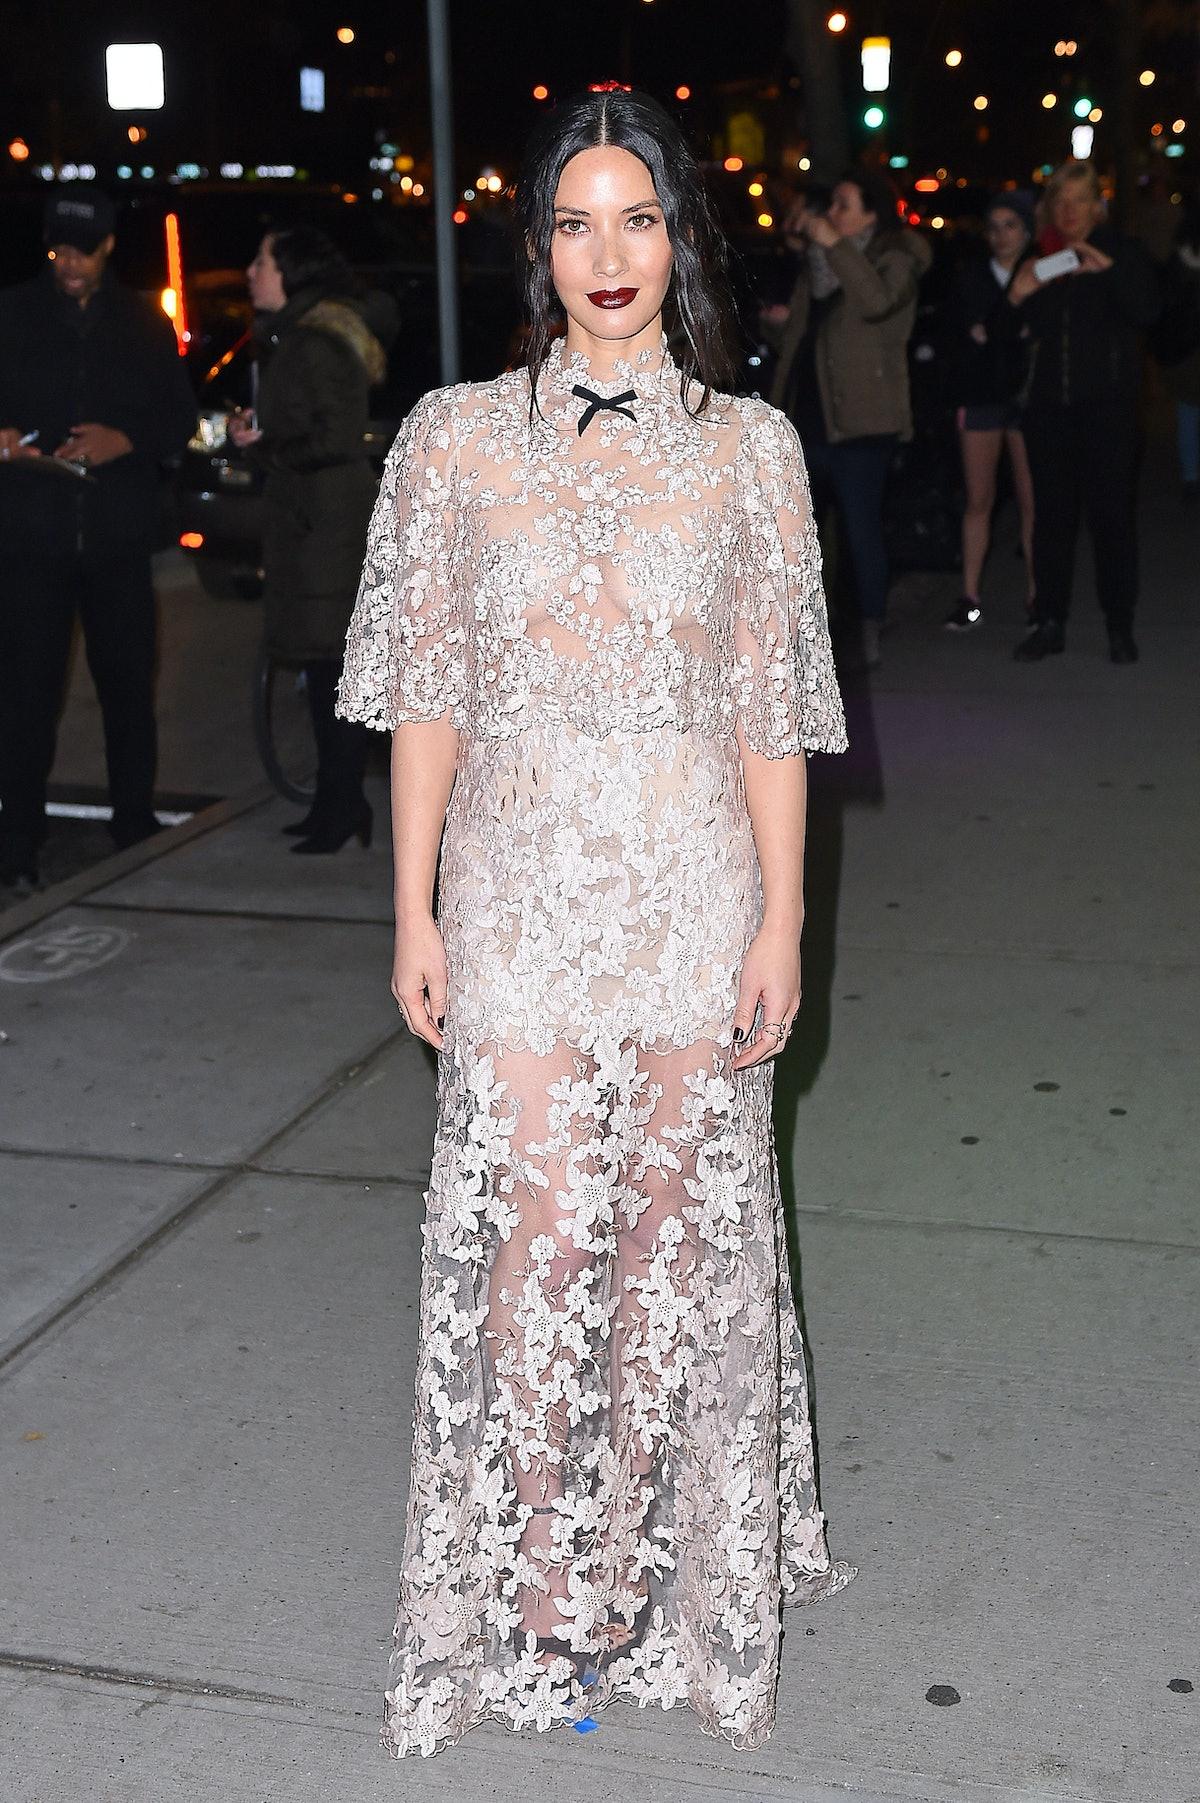 Celebrity Sightings In New York City - December 5, 2016